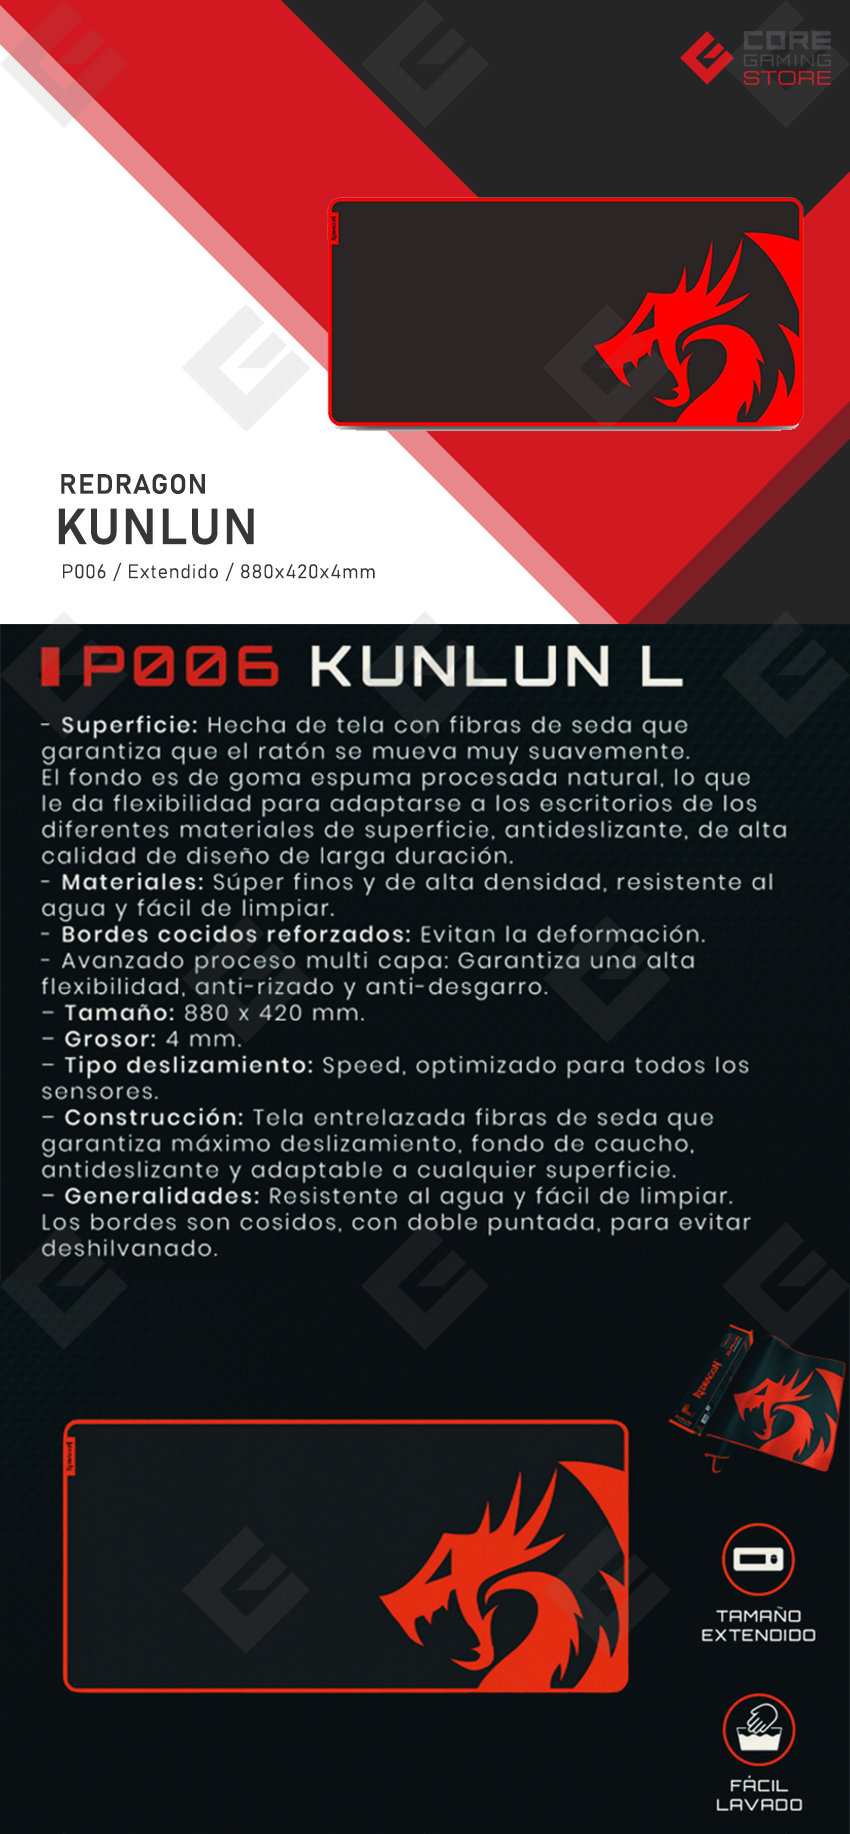 Mousepad Gamer Redragon Kunlun P006 - 880 x 420 x 4mm